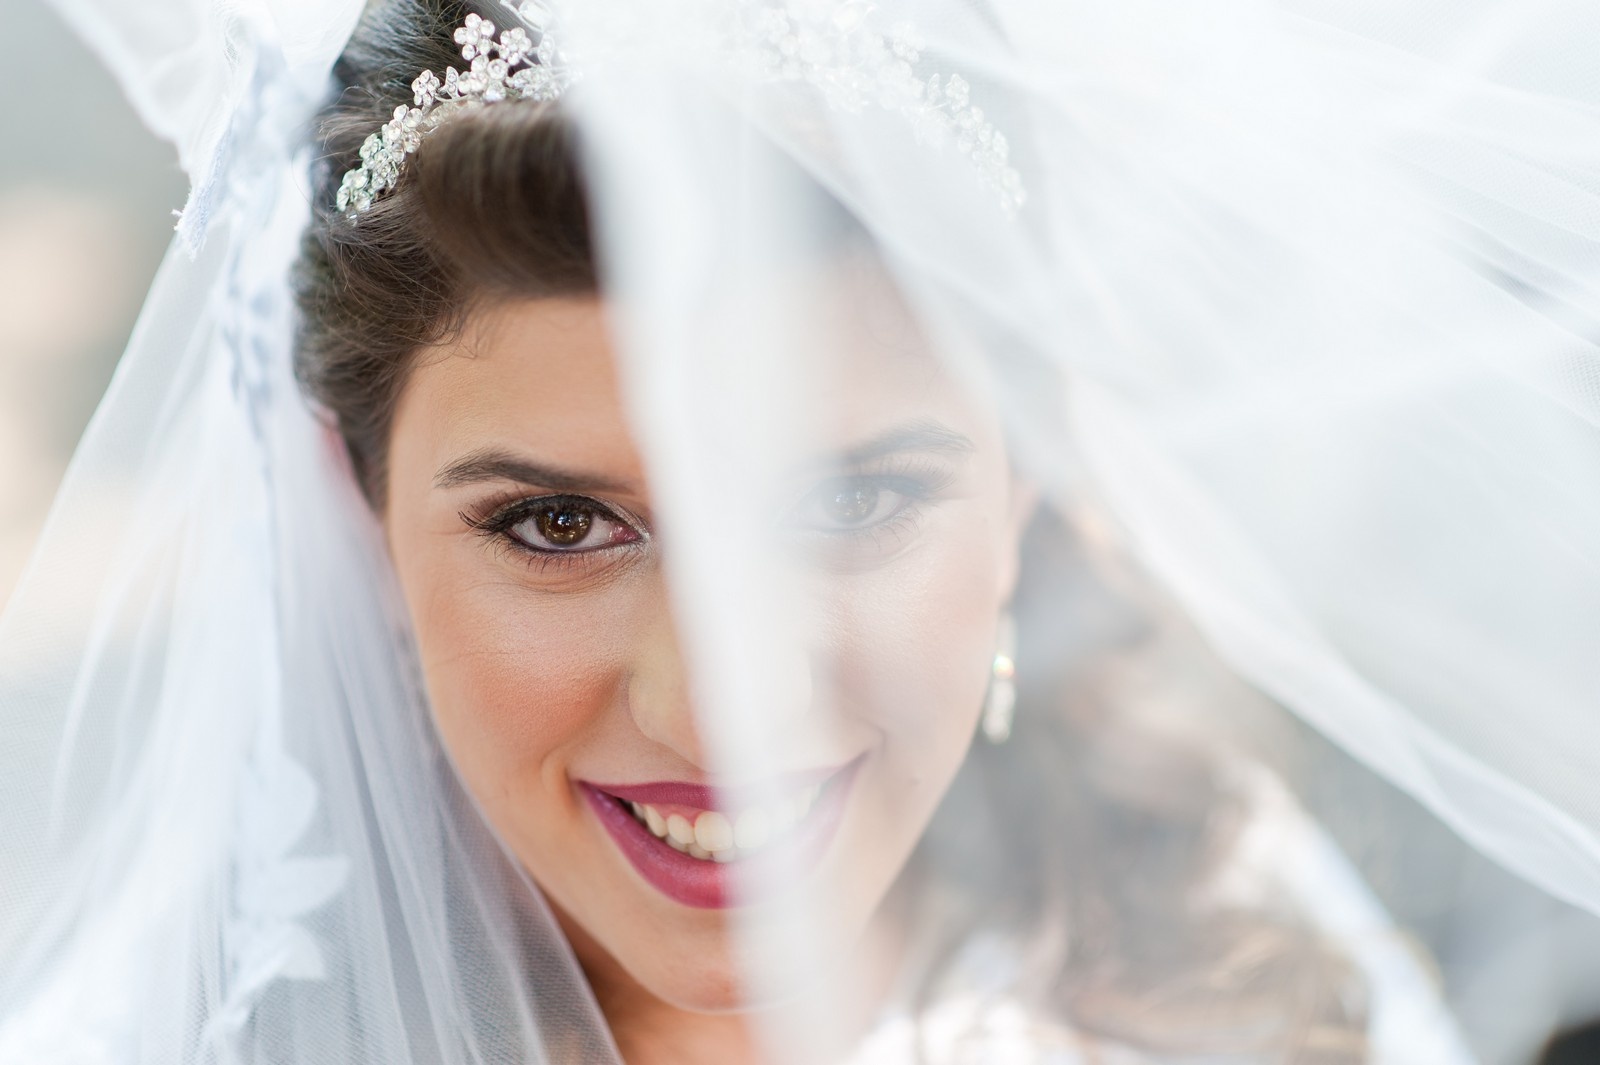 Orthodox Jewish Wedding, Dyker Beach Park and Golf Course, Brooklyn, New York, Photo by Chaim Schvarcz, Bride portrait, Veil, Makeup